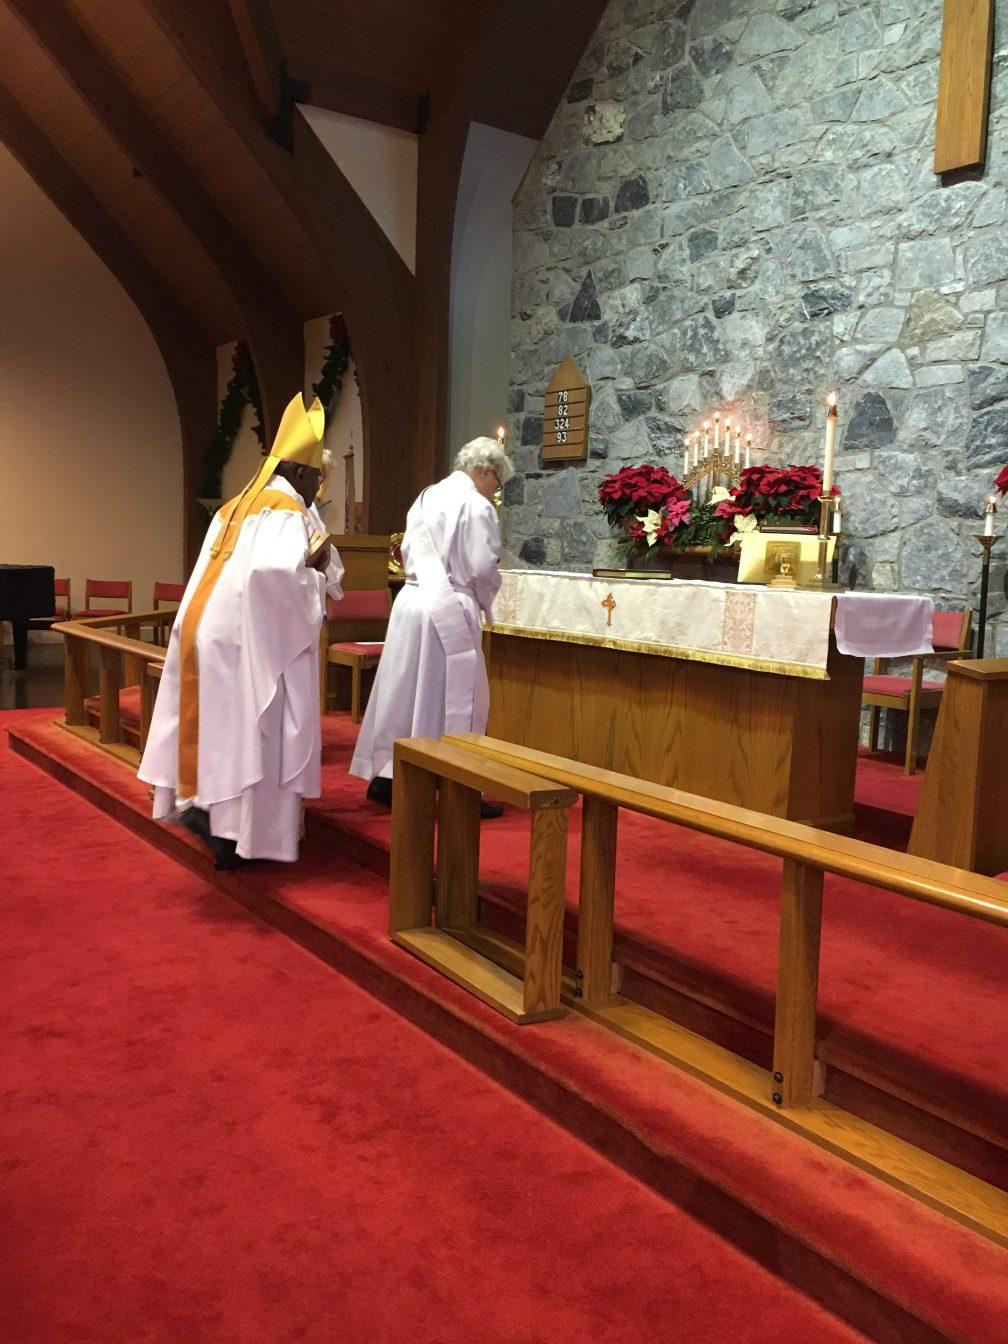 Bishop Baxter and Nancy Rementer